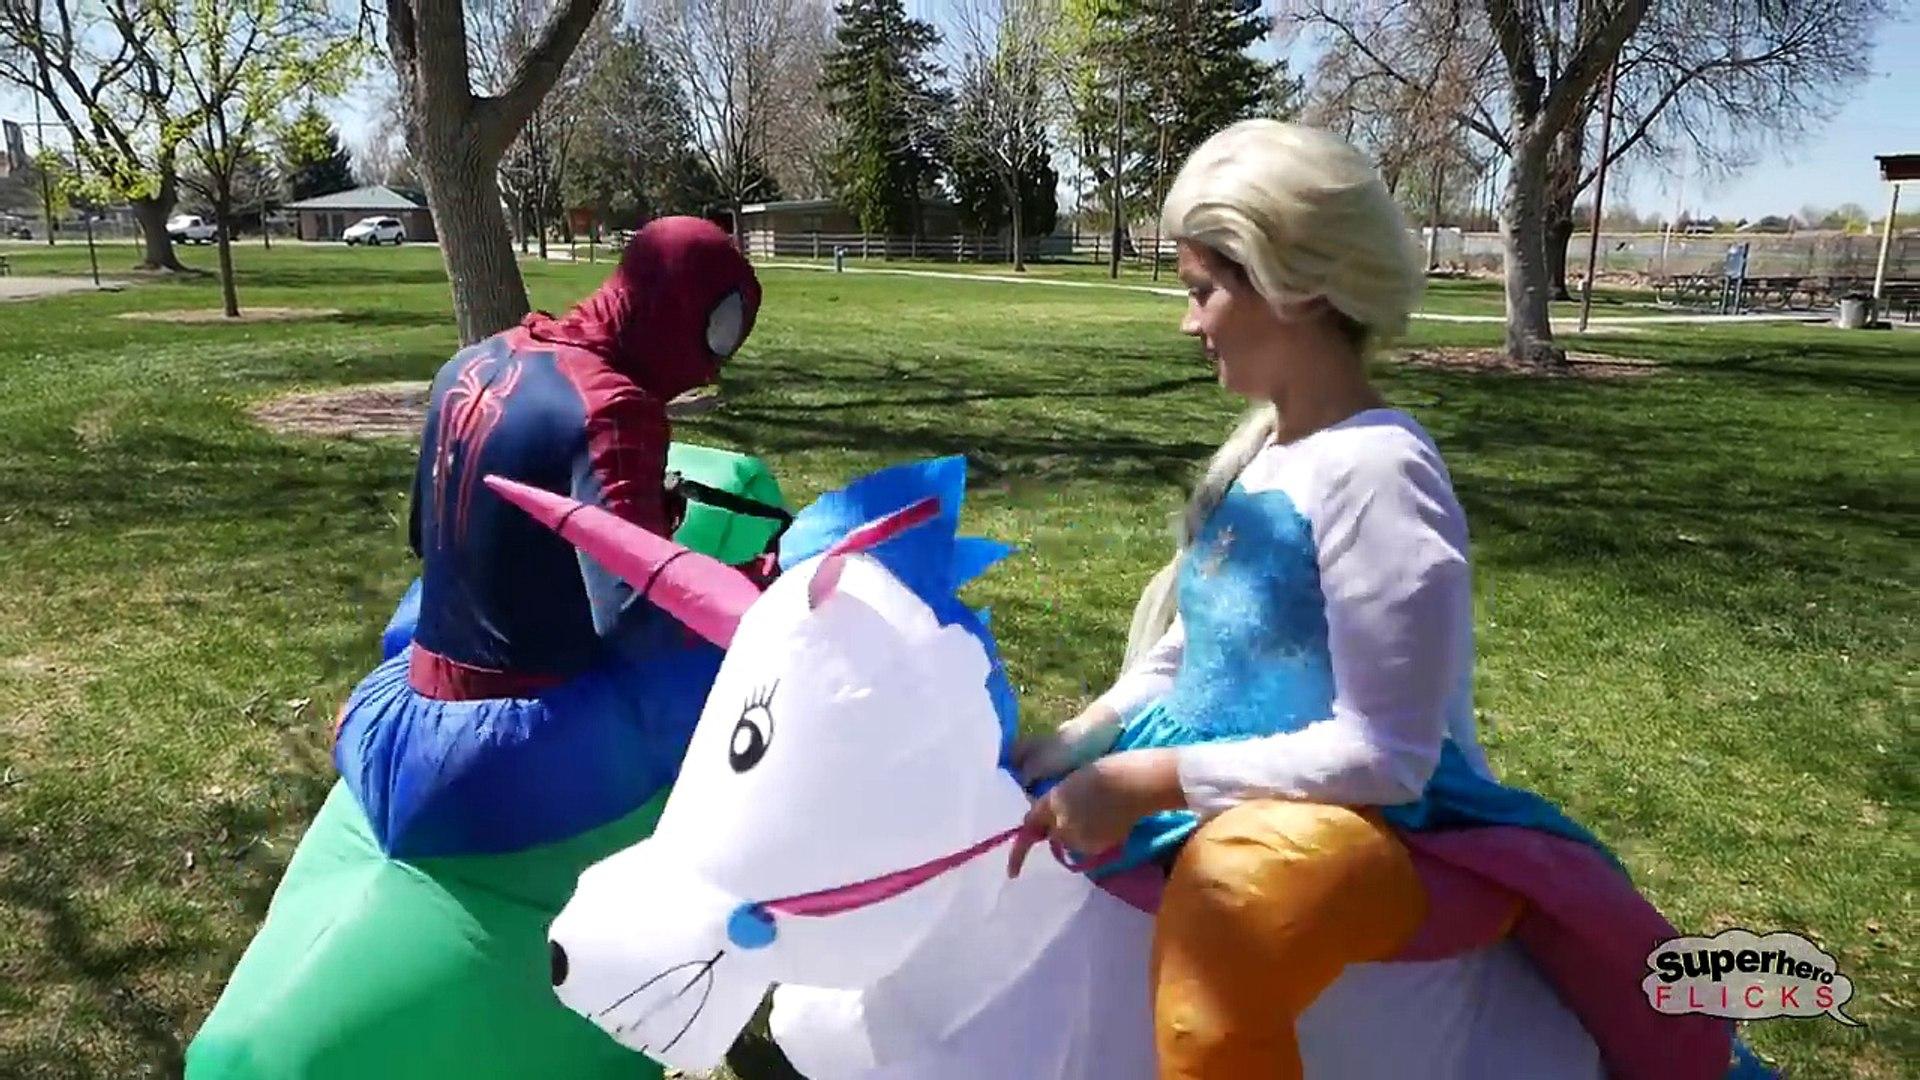 Iron Spiderman vs Rhino vs Olaf Rhino Roba Avión de Olaf | la Vida Real Superhéroe Mo